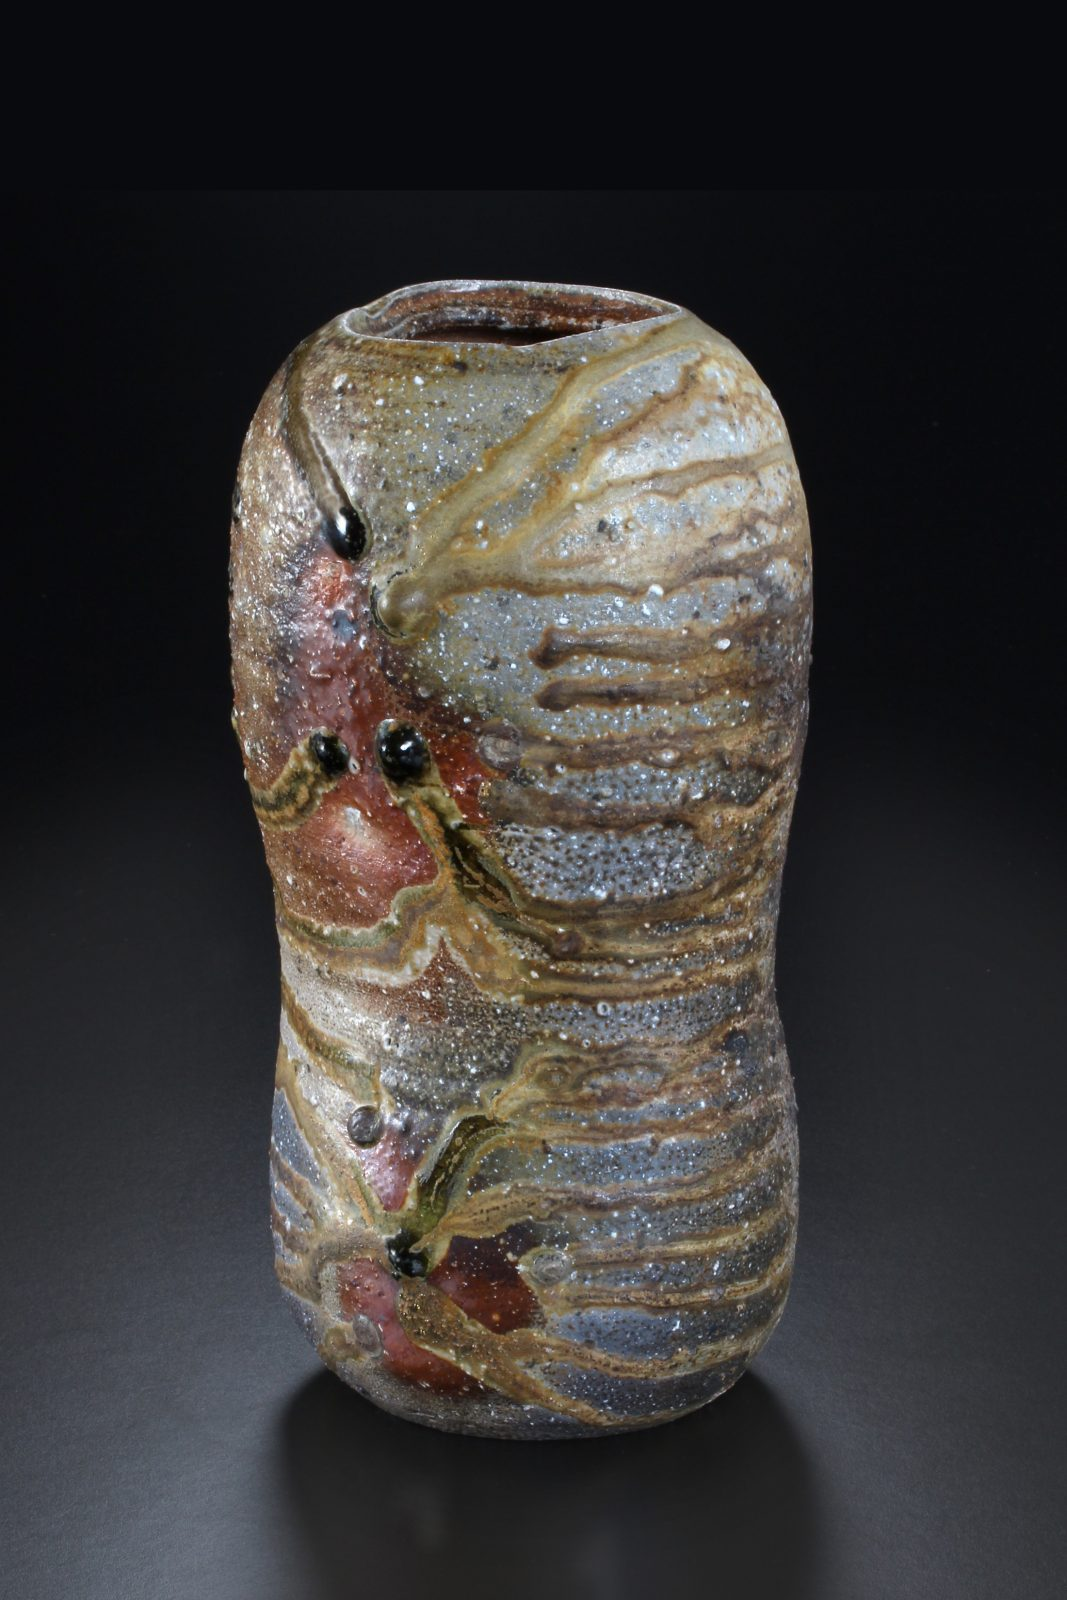 Uwe Löllmann –Gefäßform –h39cm, Holzbrand – Galerie Metzger Aschaffenburg Kunst Keramik angewandte Kunst Art Gallery Woodfiring